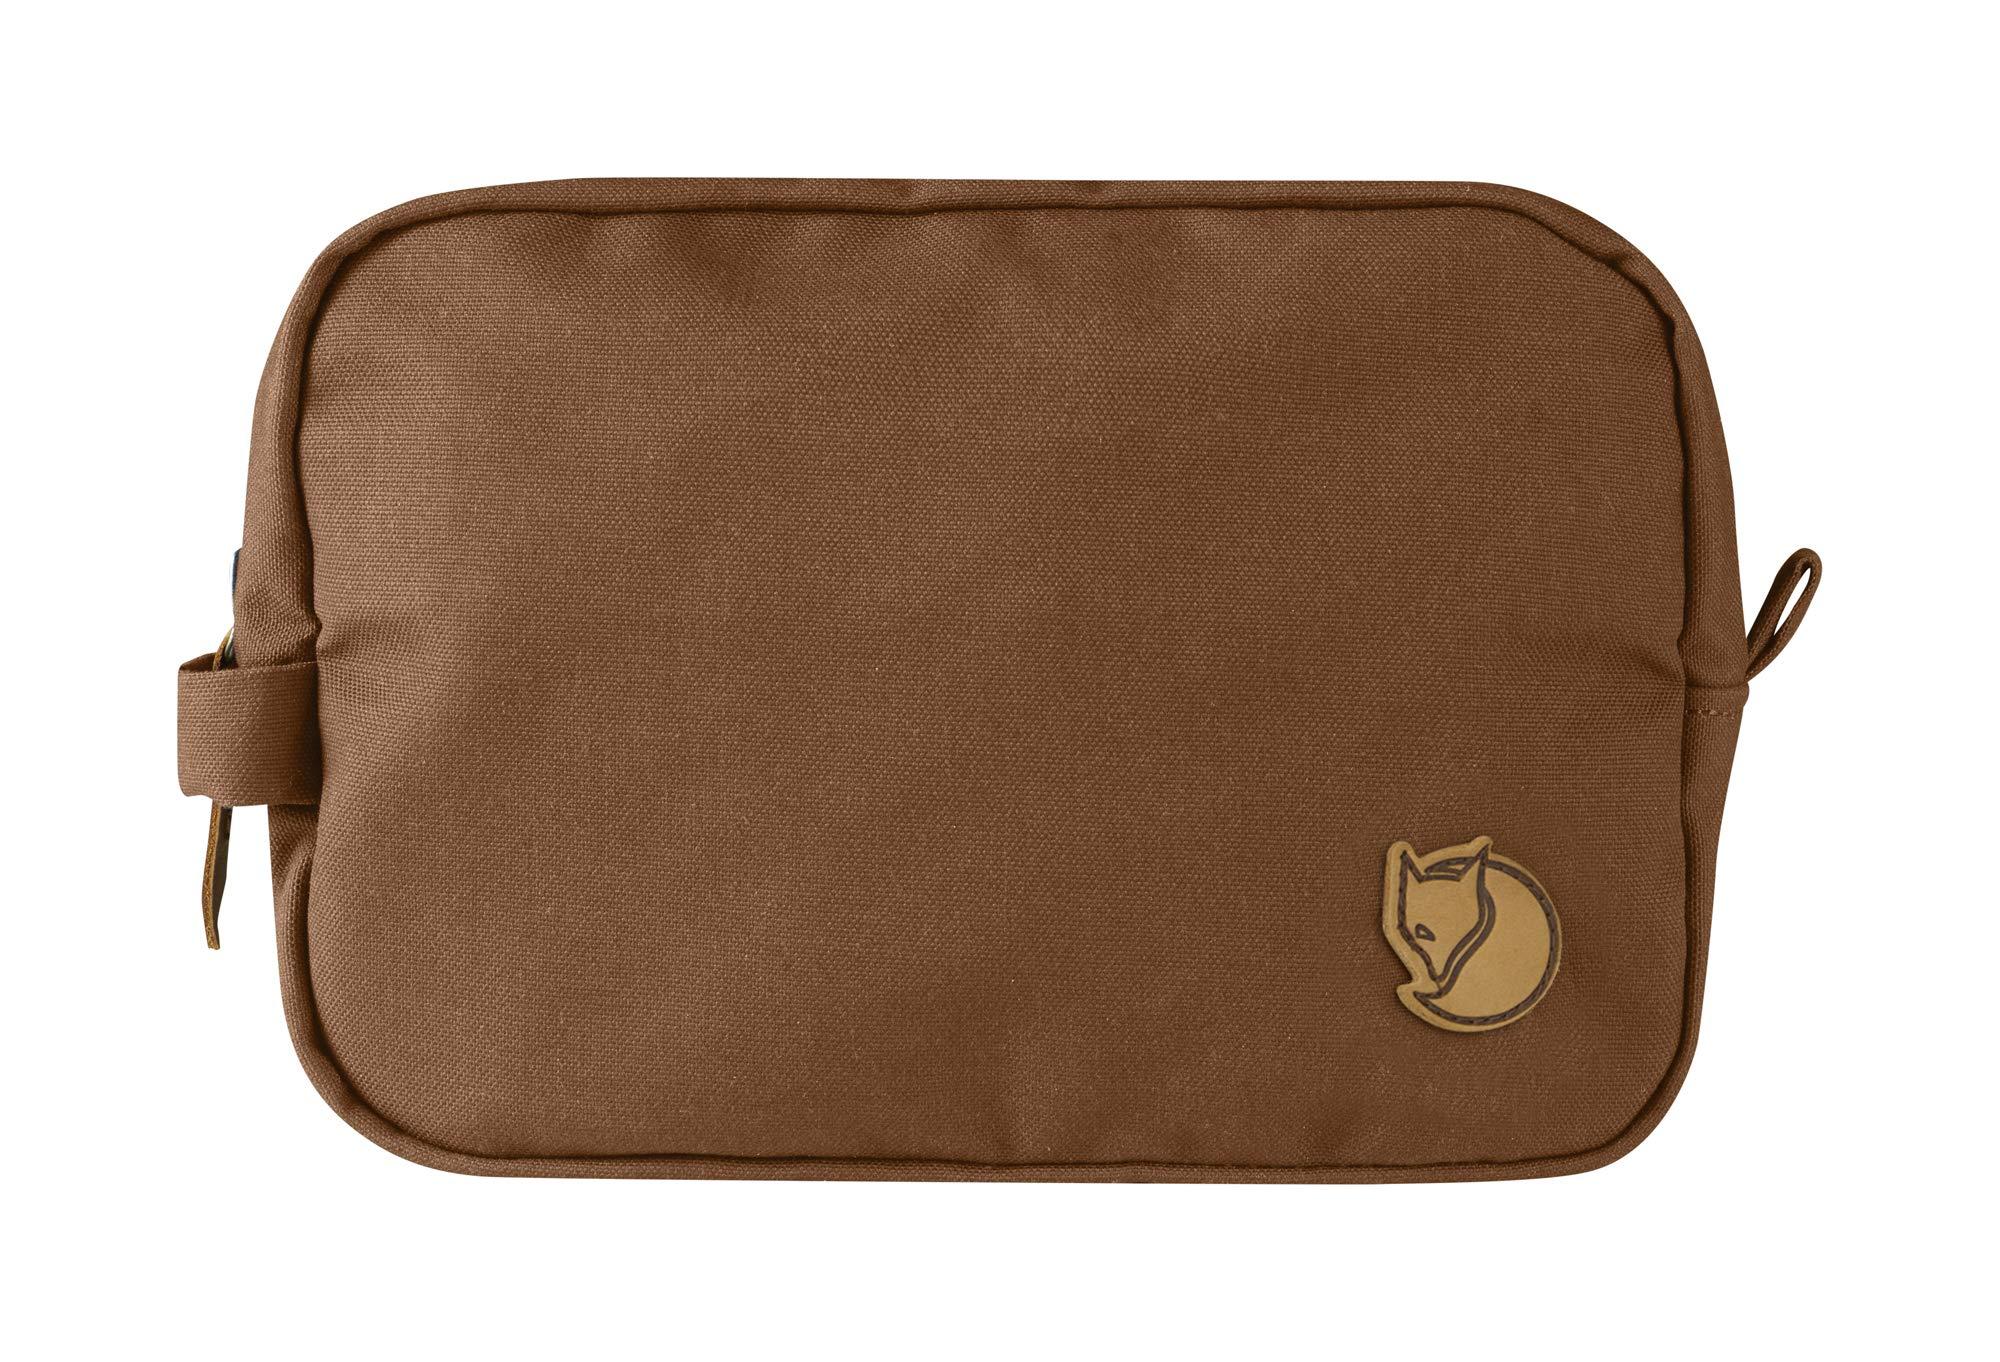 Fjallraven - Gear Bag, Chestnut by Fjallraven